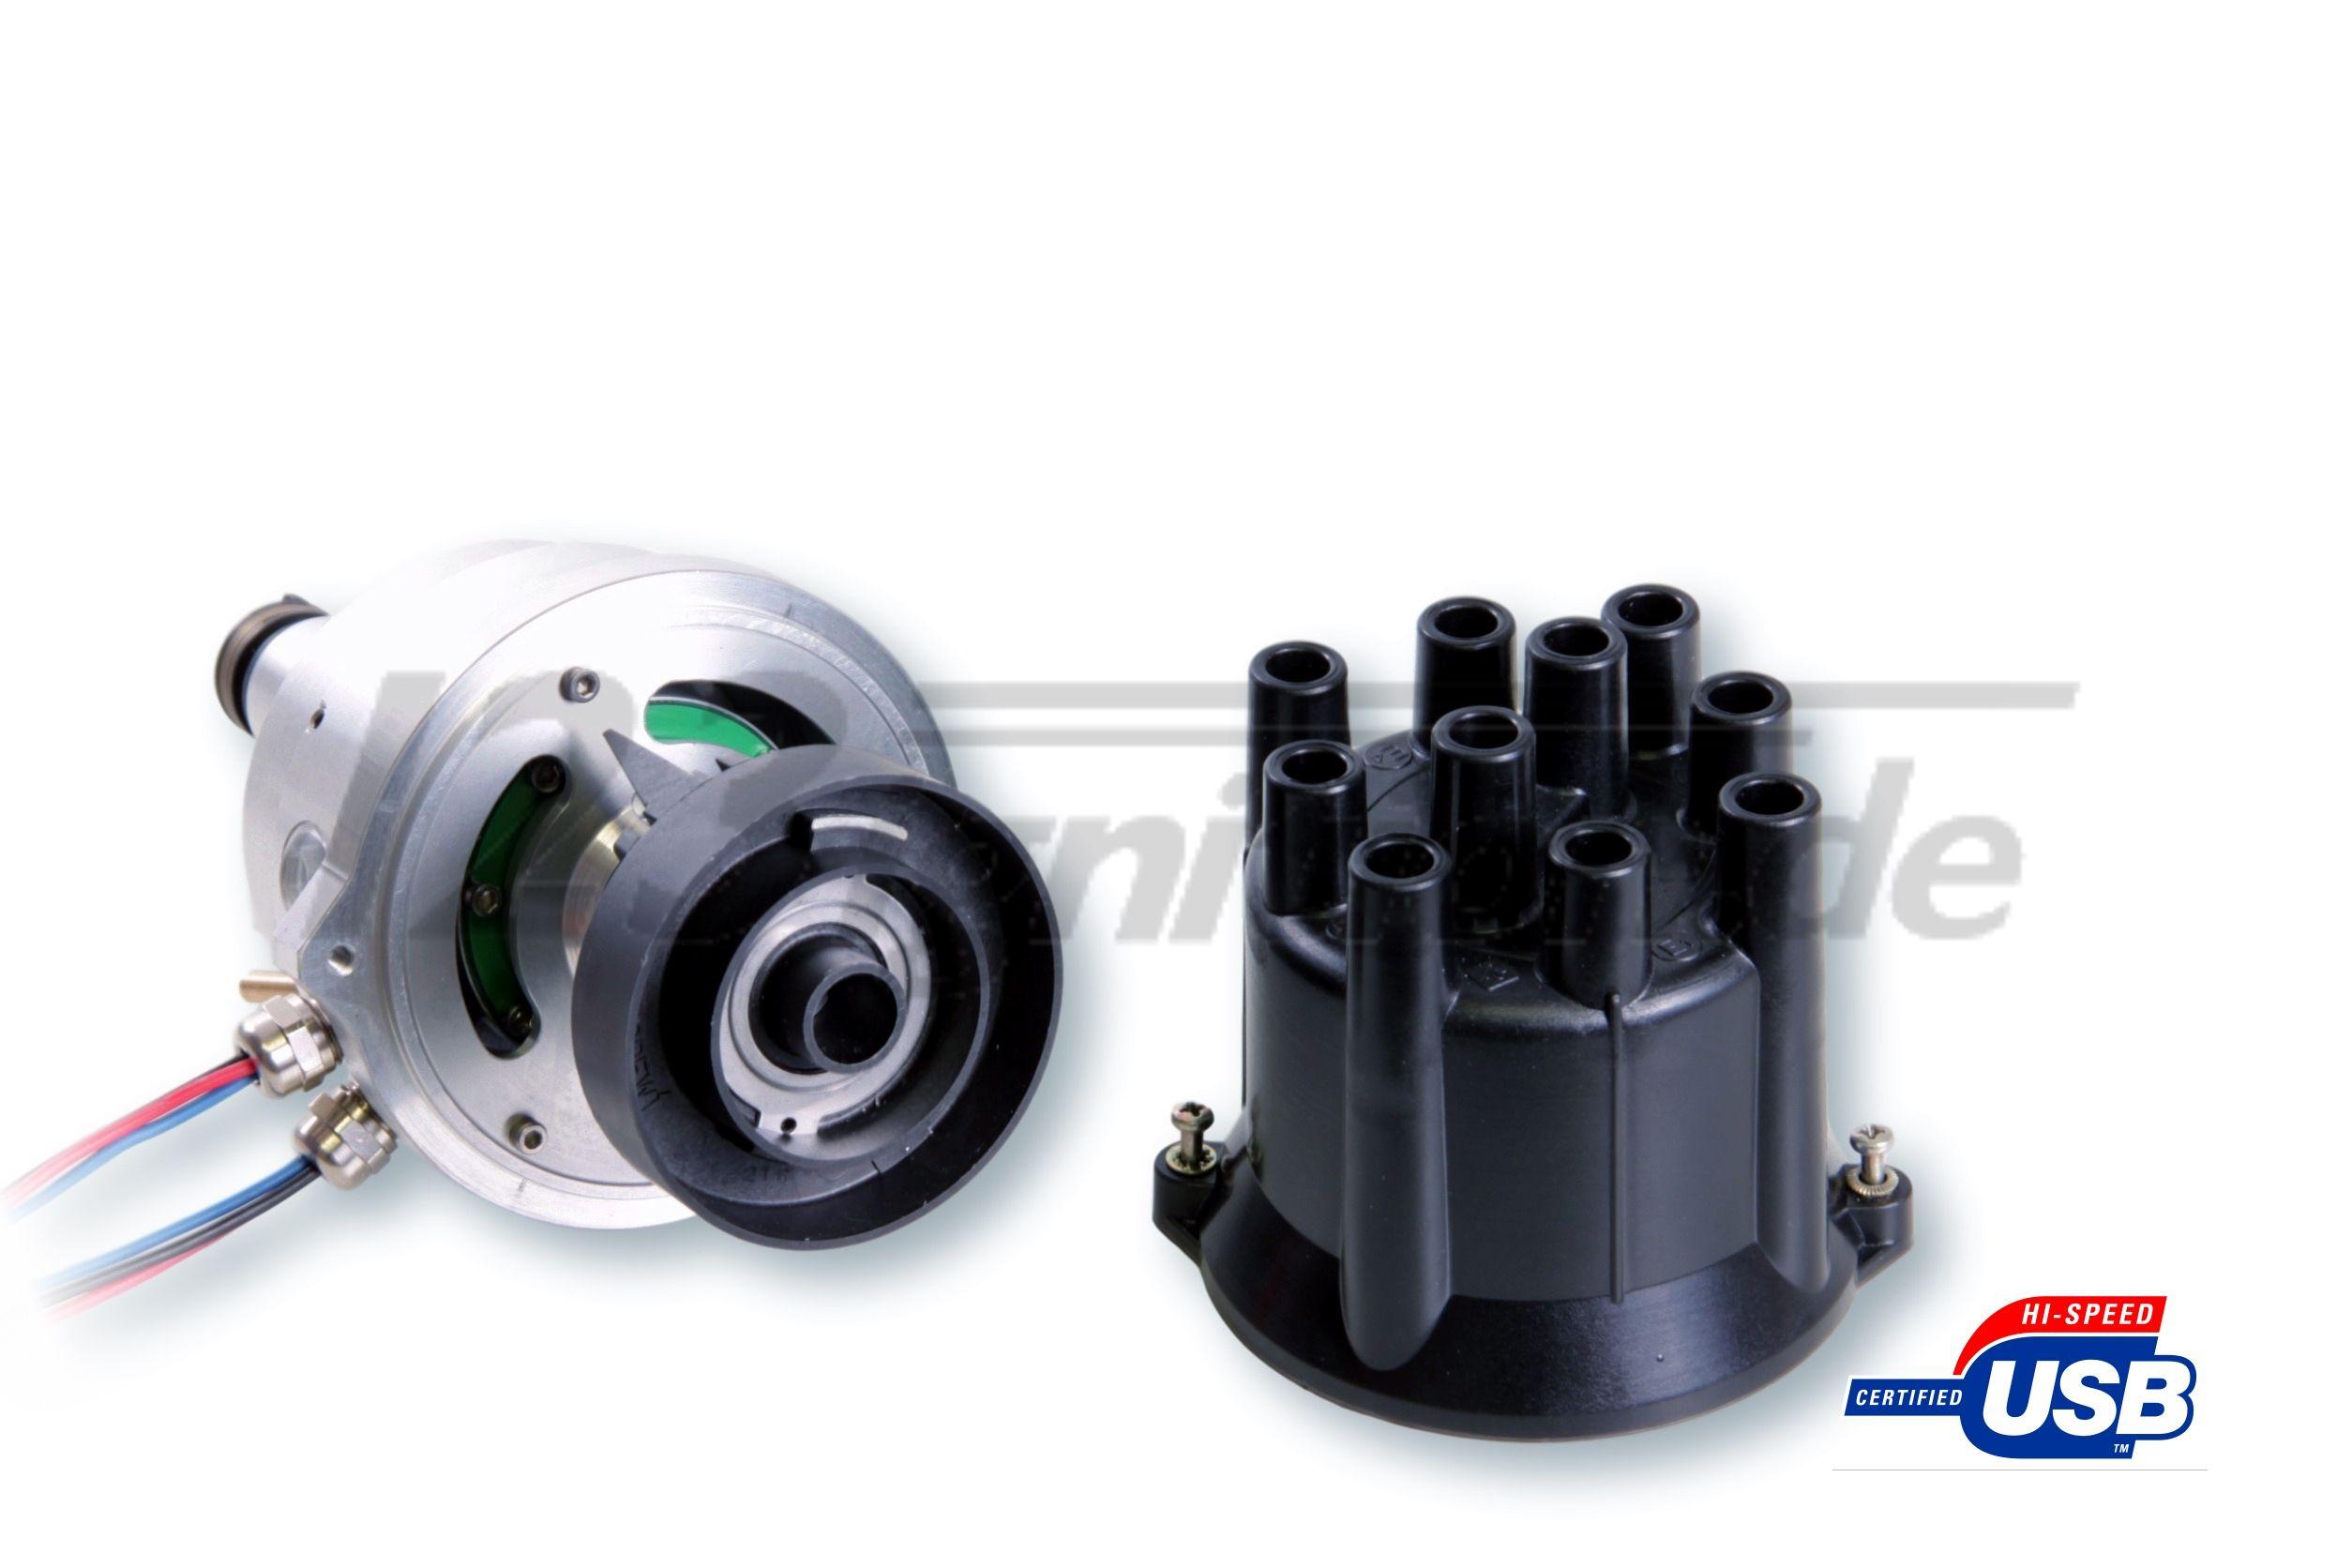 123\TUNE USB Zündverteiler für Alfa Romeo Giulia Nuova Spider Bertone Duetto offene Verteilerkappe